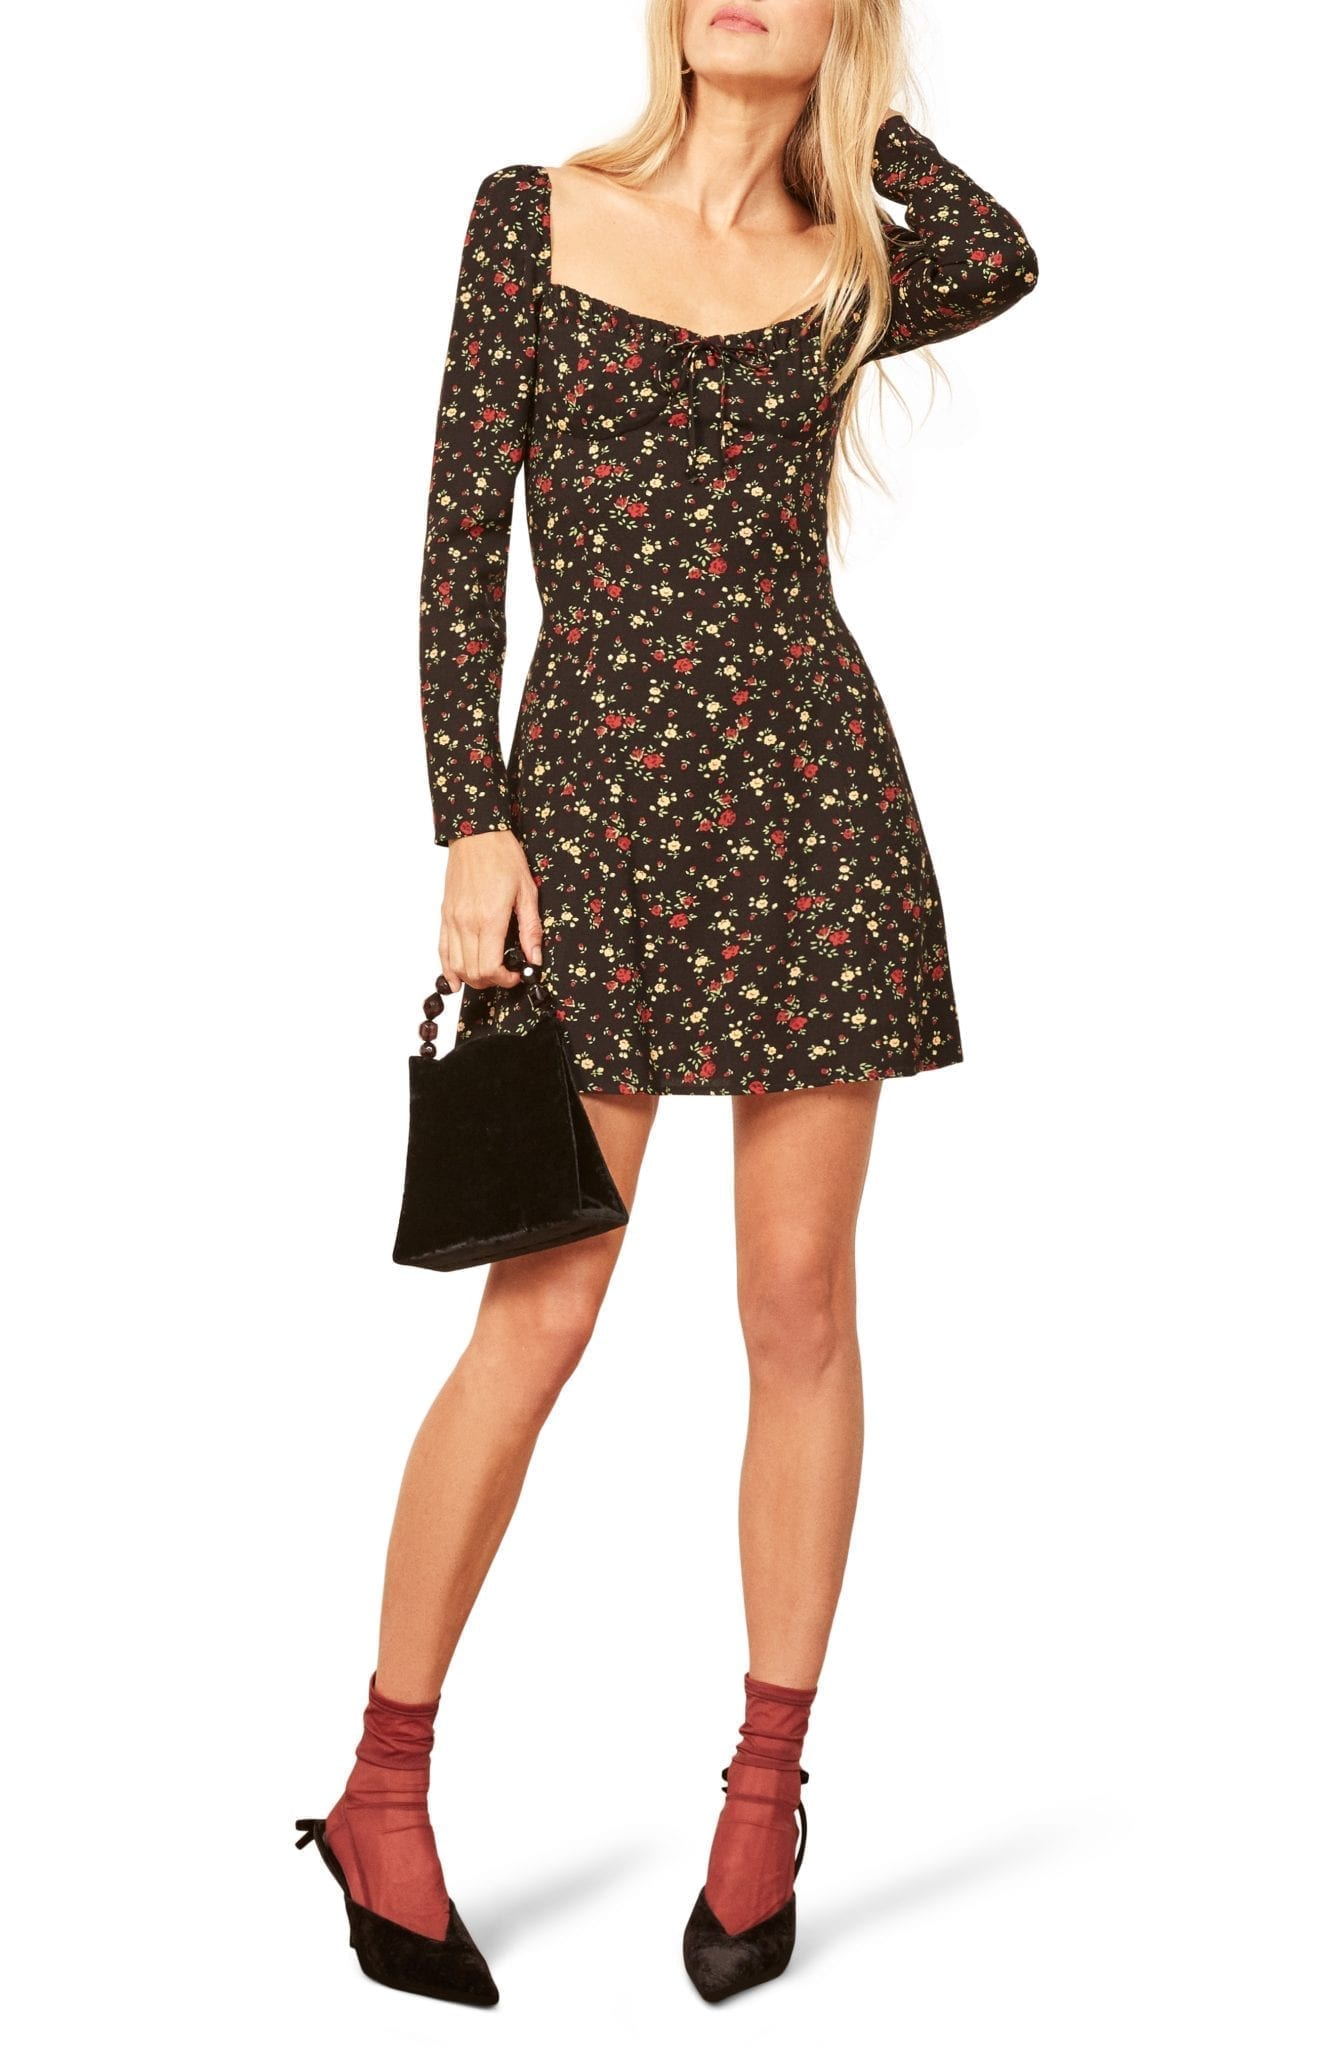 REFORMATION Sydney Sweetheart Mini Black / Floral Printed Dress